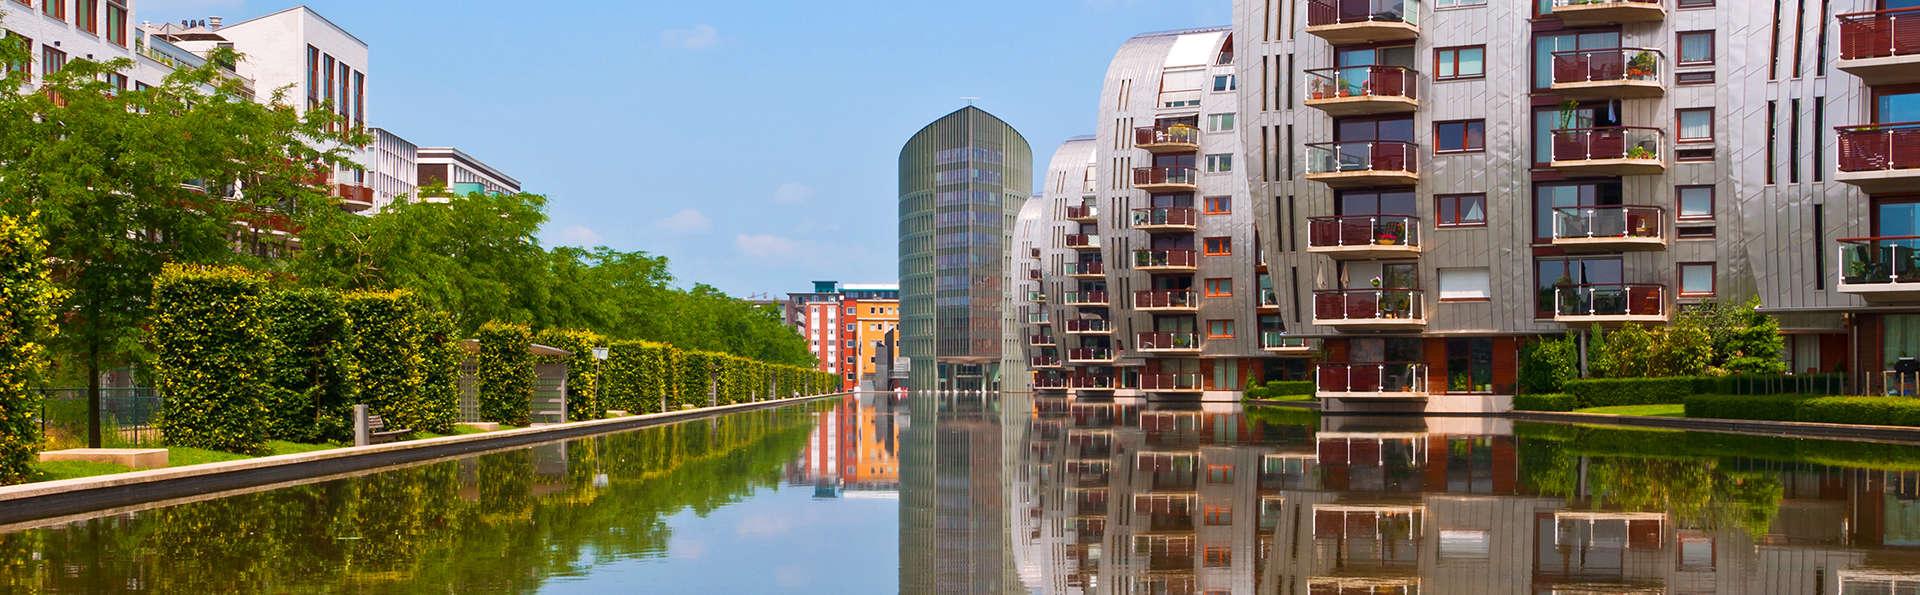 Fletcher Hotel-Restaurant 's-Hertogenbosch - EDIT_Destination_Den_Bosch.jpg